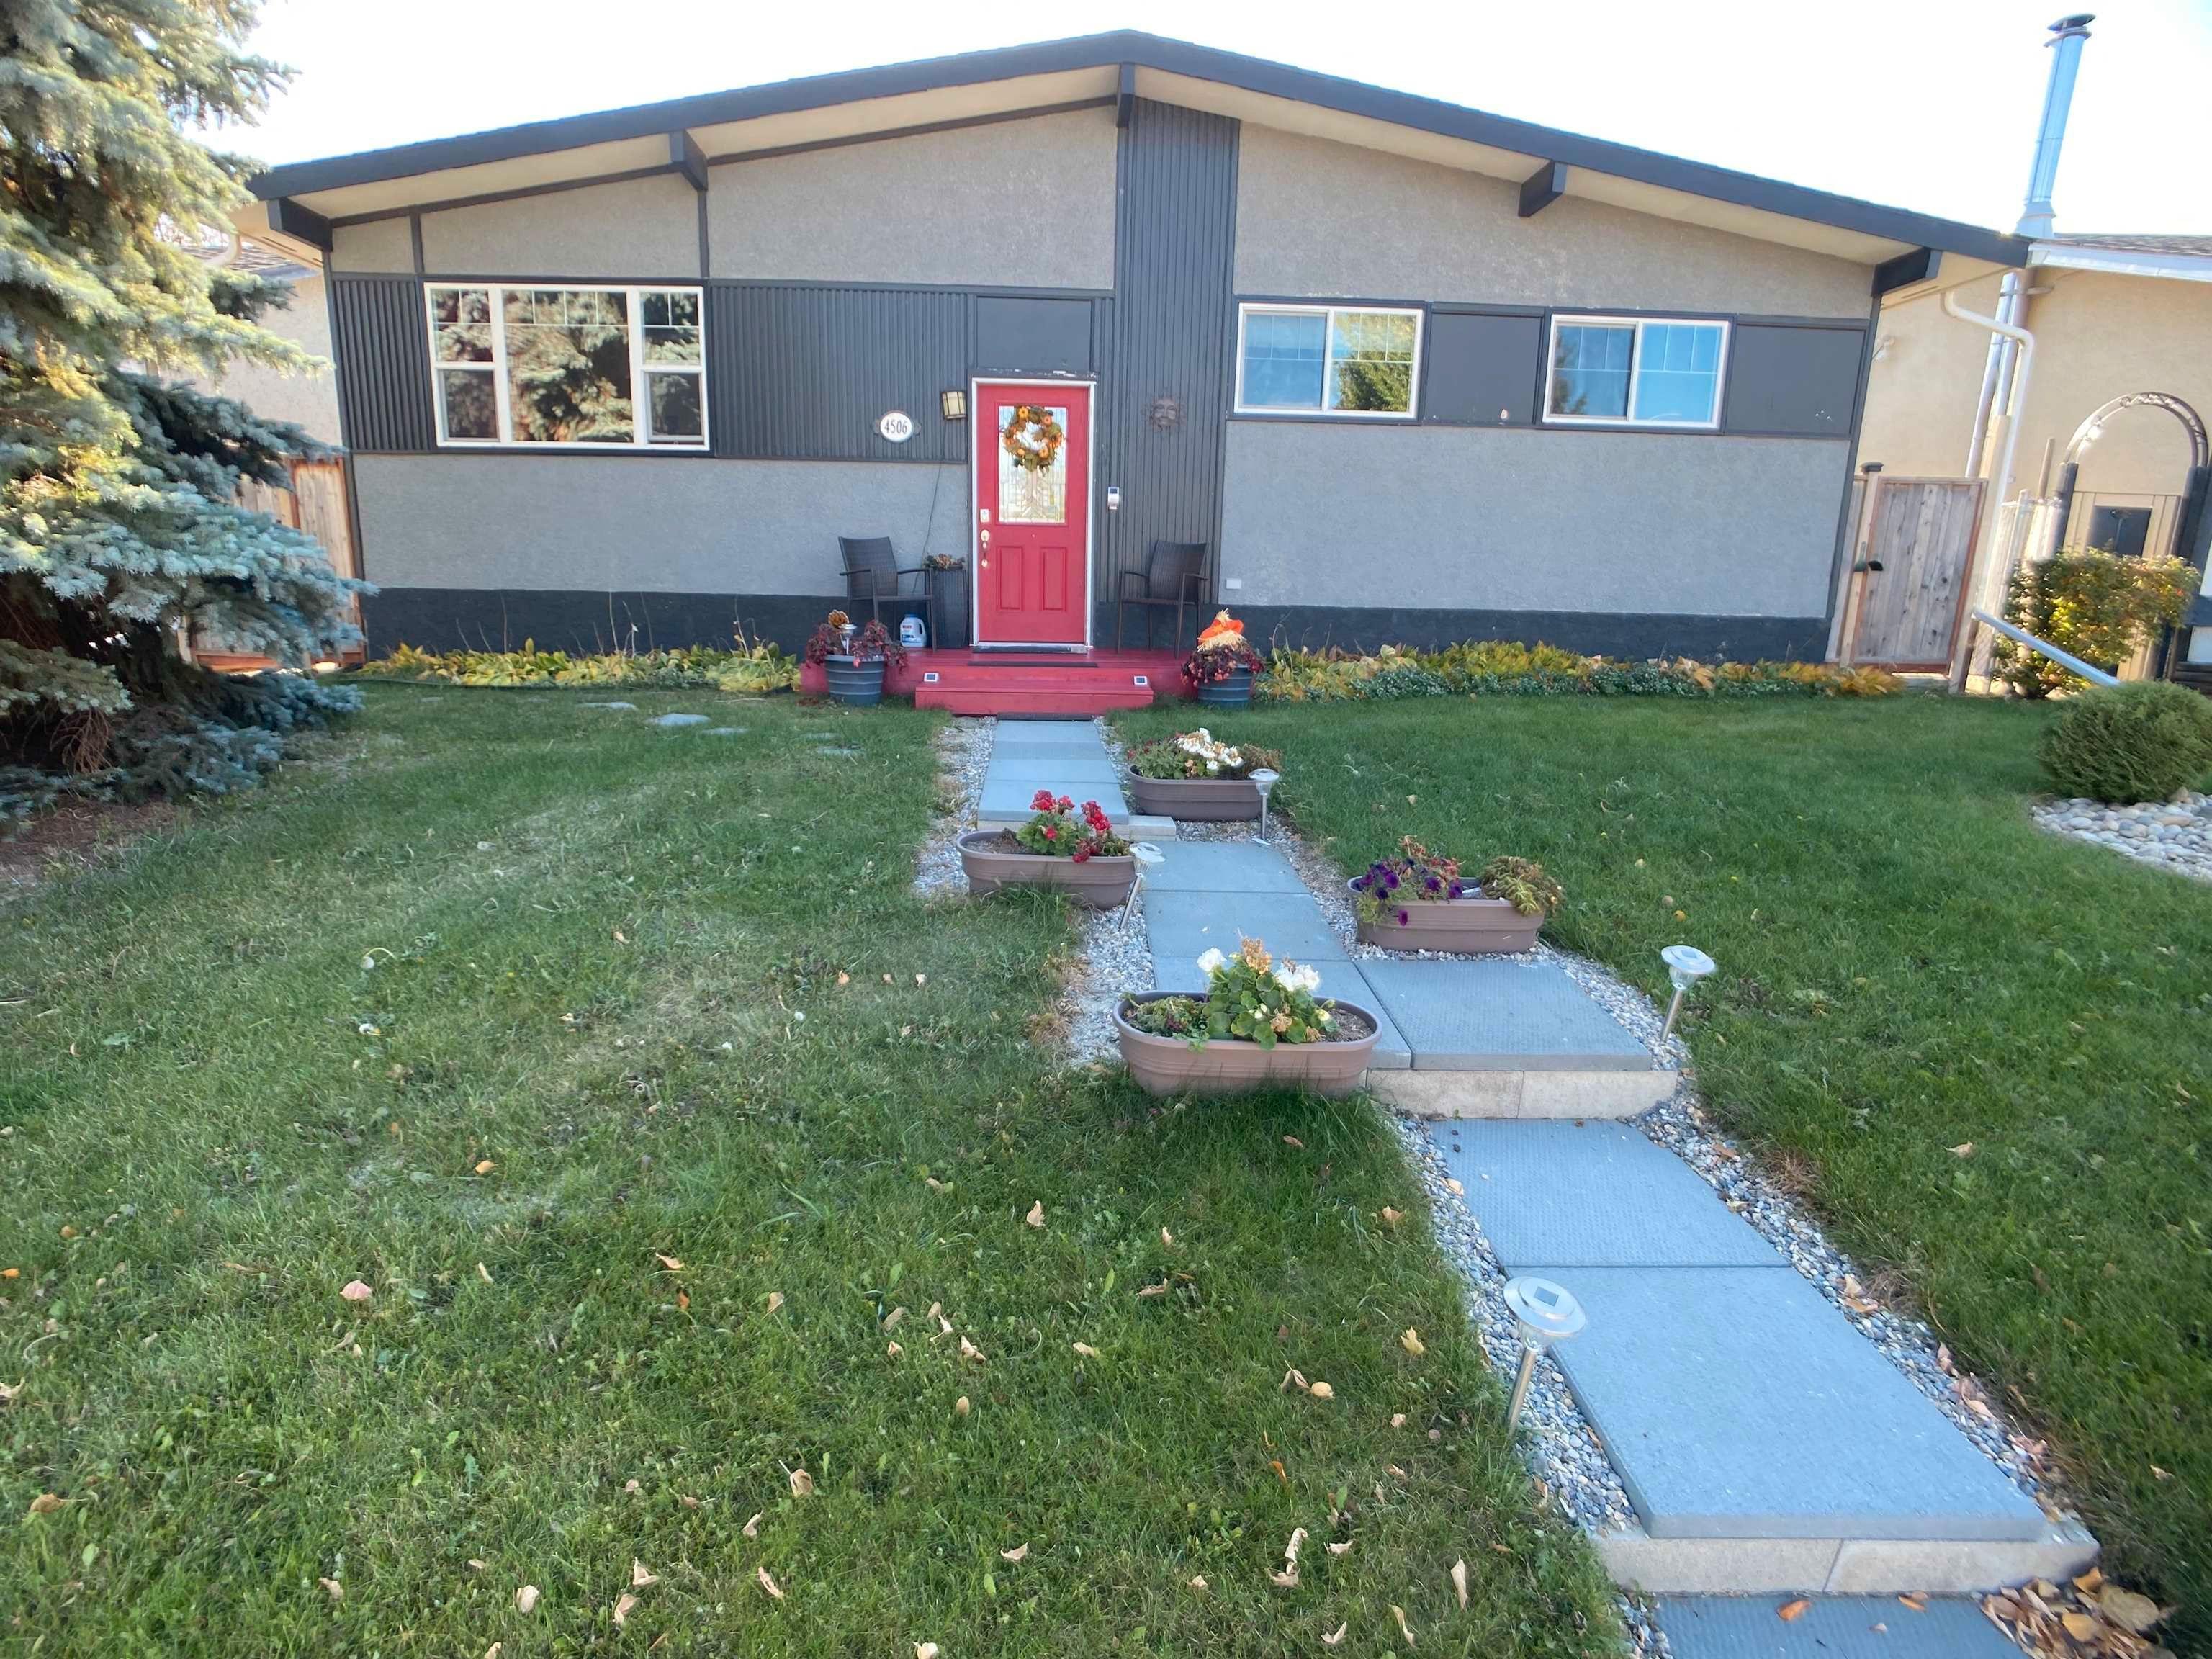 Main Photo: 4506 45 Avenue: Stony Plain House for sale : MLS®# E4265749